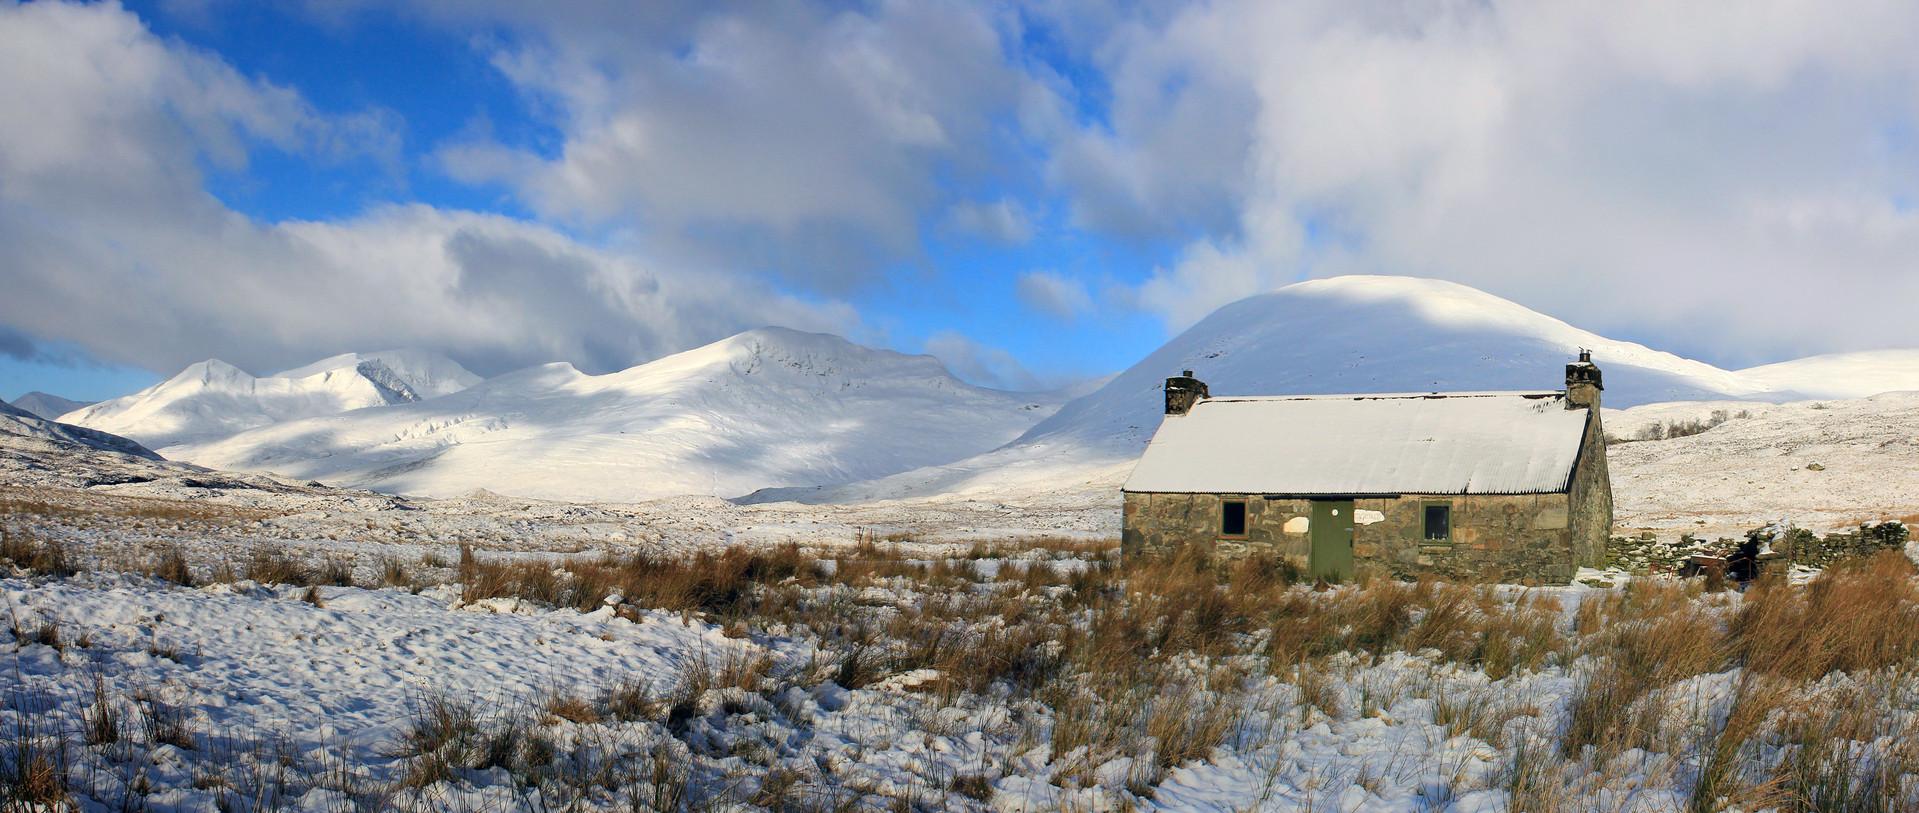 Meanach Bothy, Central Highlands